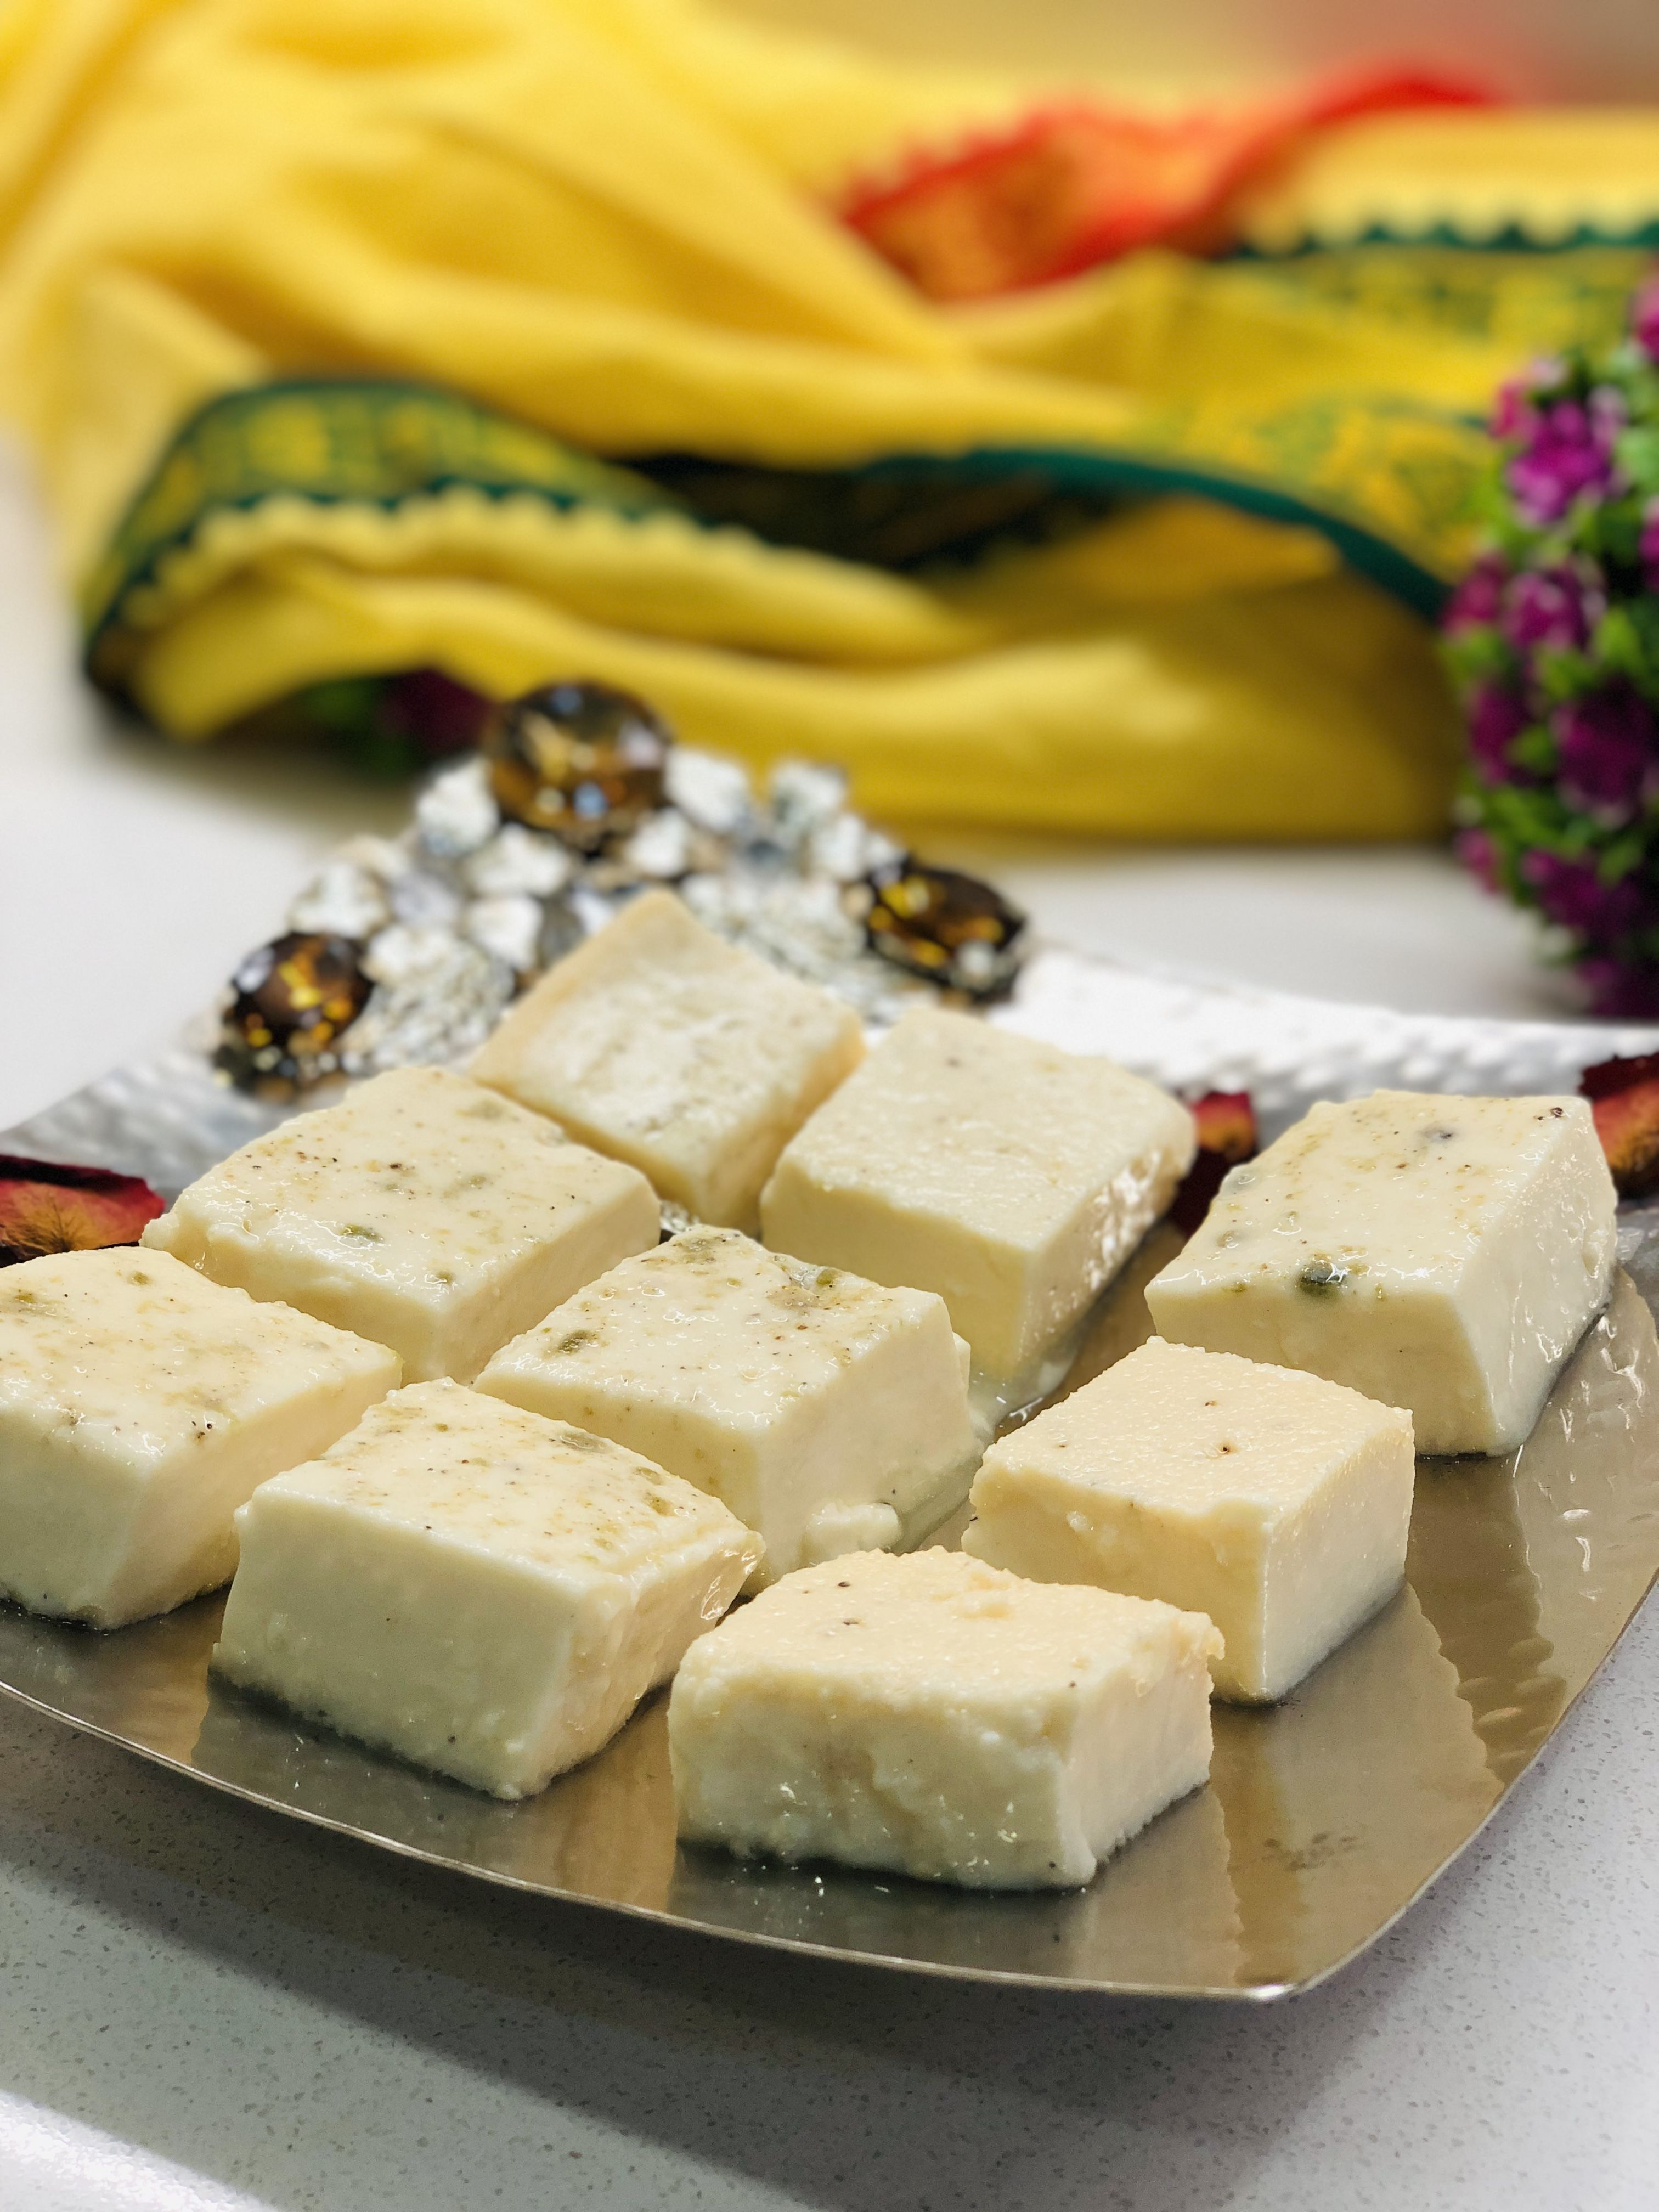 Instant Kharwas Bari Junnu Party Desserts Recipes Desserts